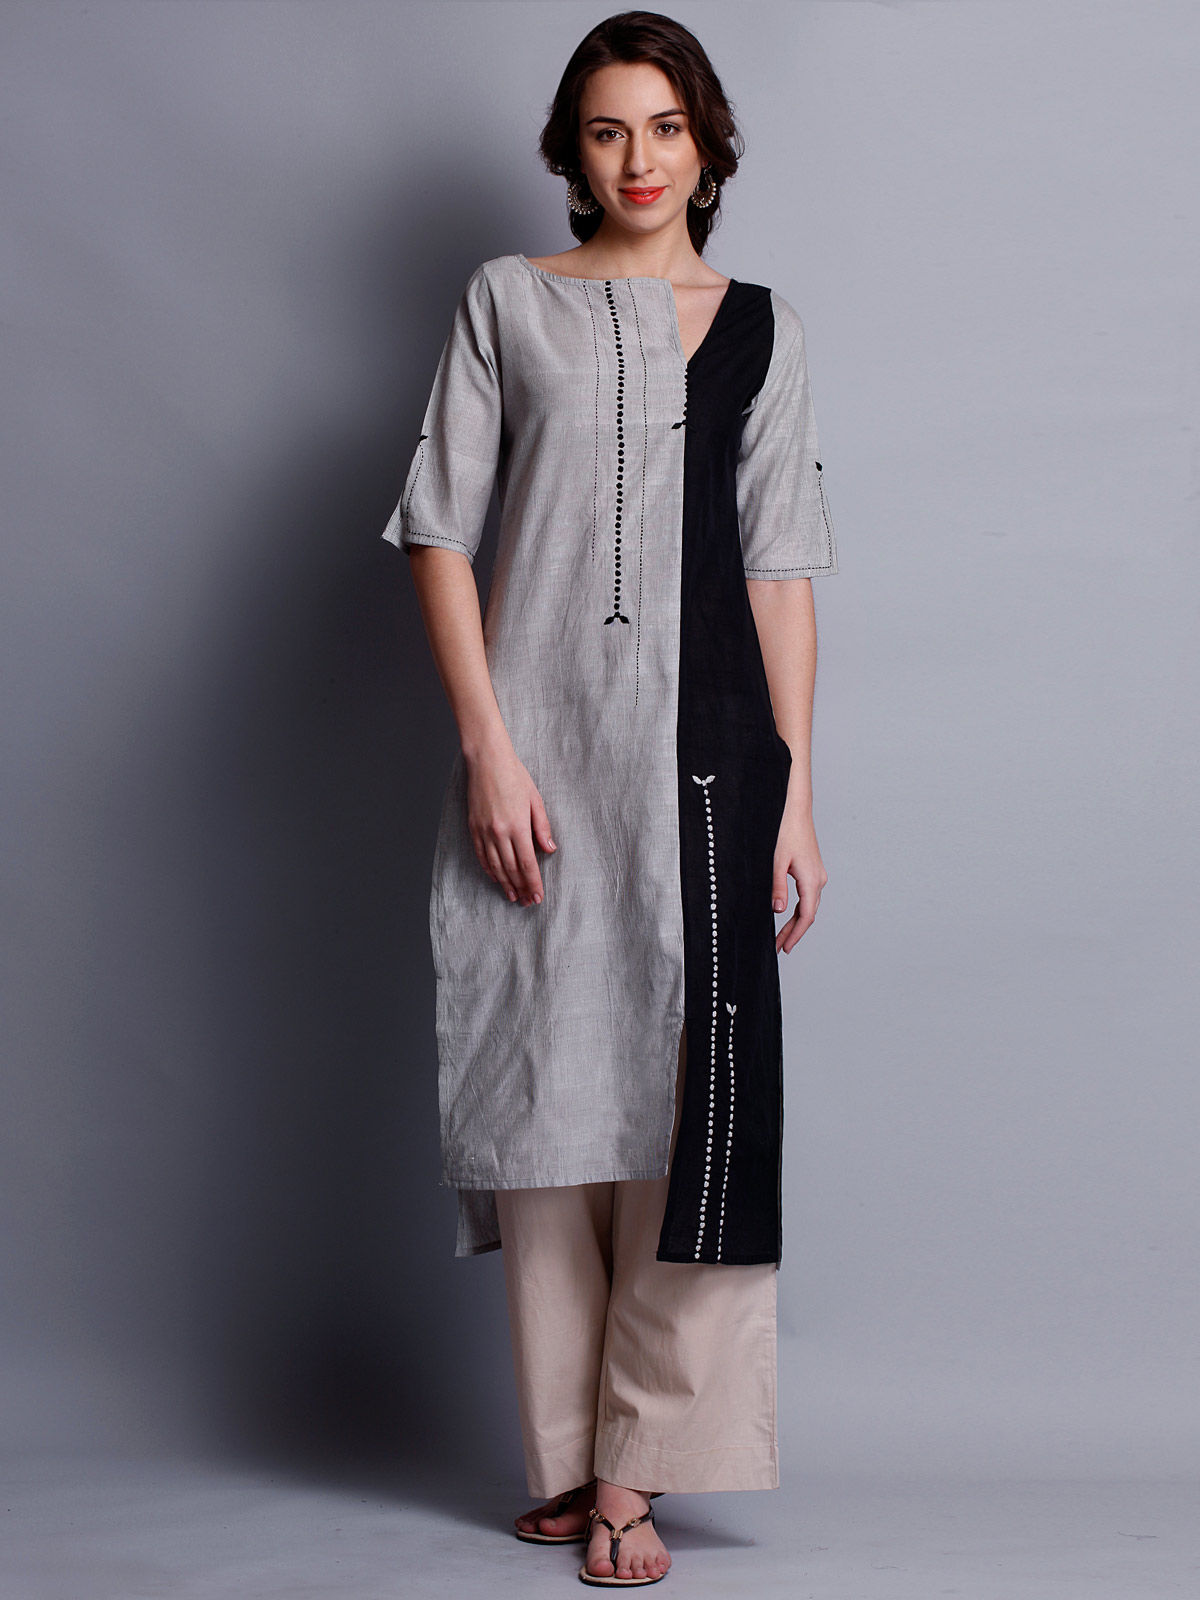 Patti work embroidered grey & black long kurta